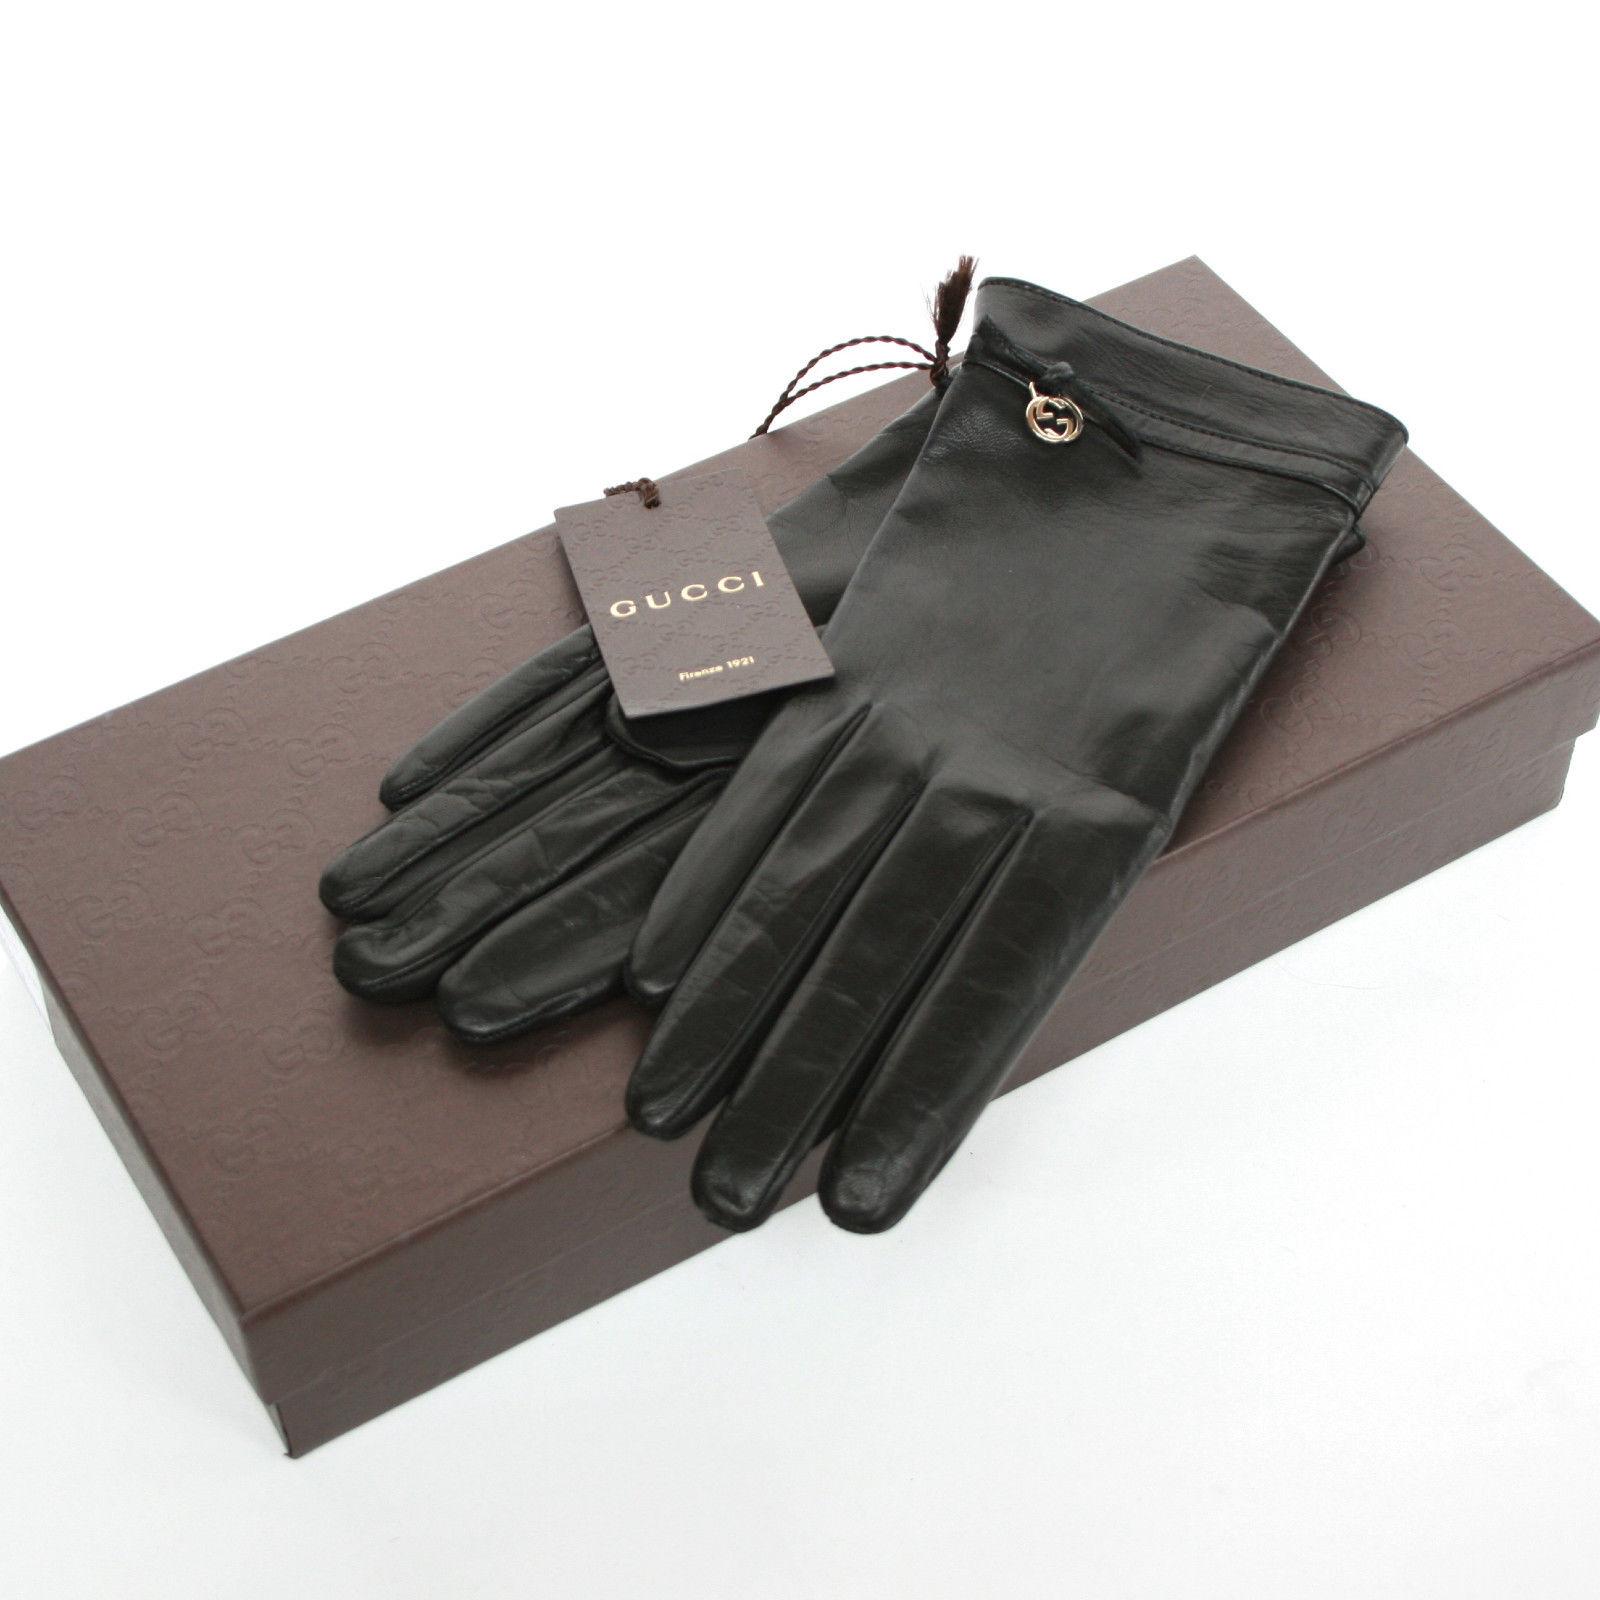 http://stores.ebay.com/The-Couture-Auction-Co?_trksid=p2047675.l2563